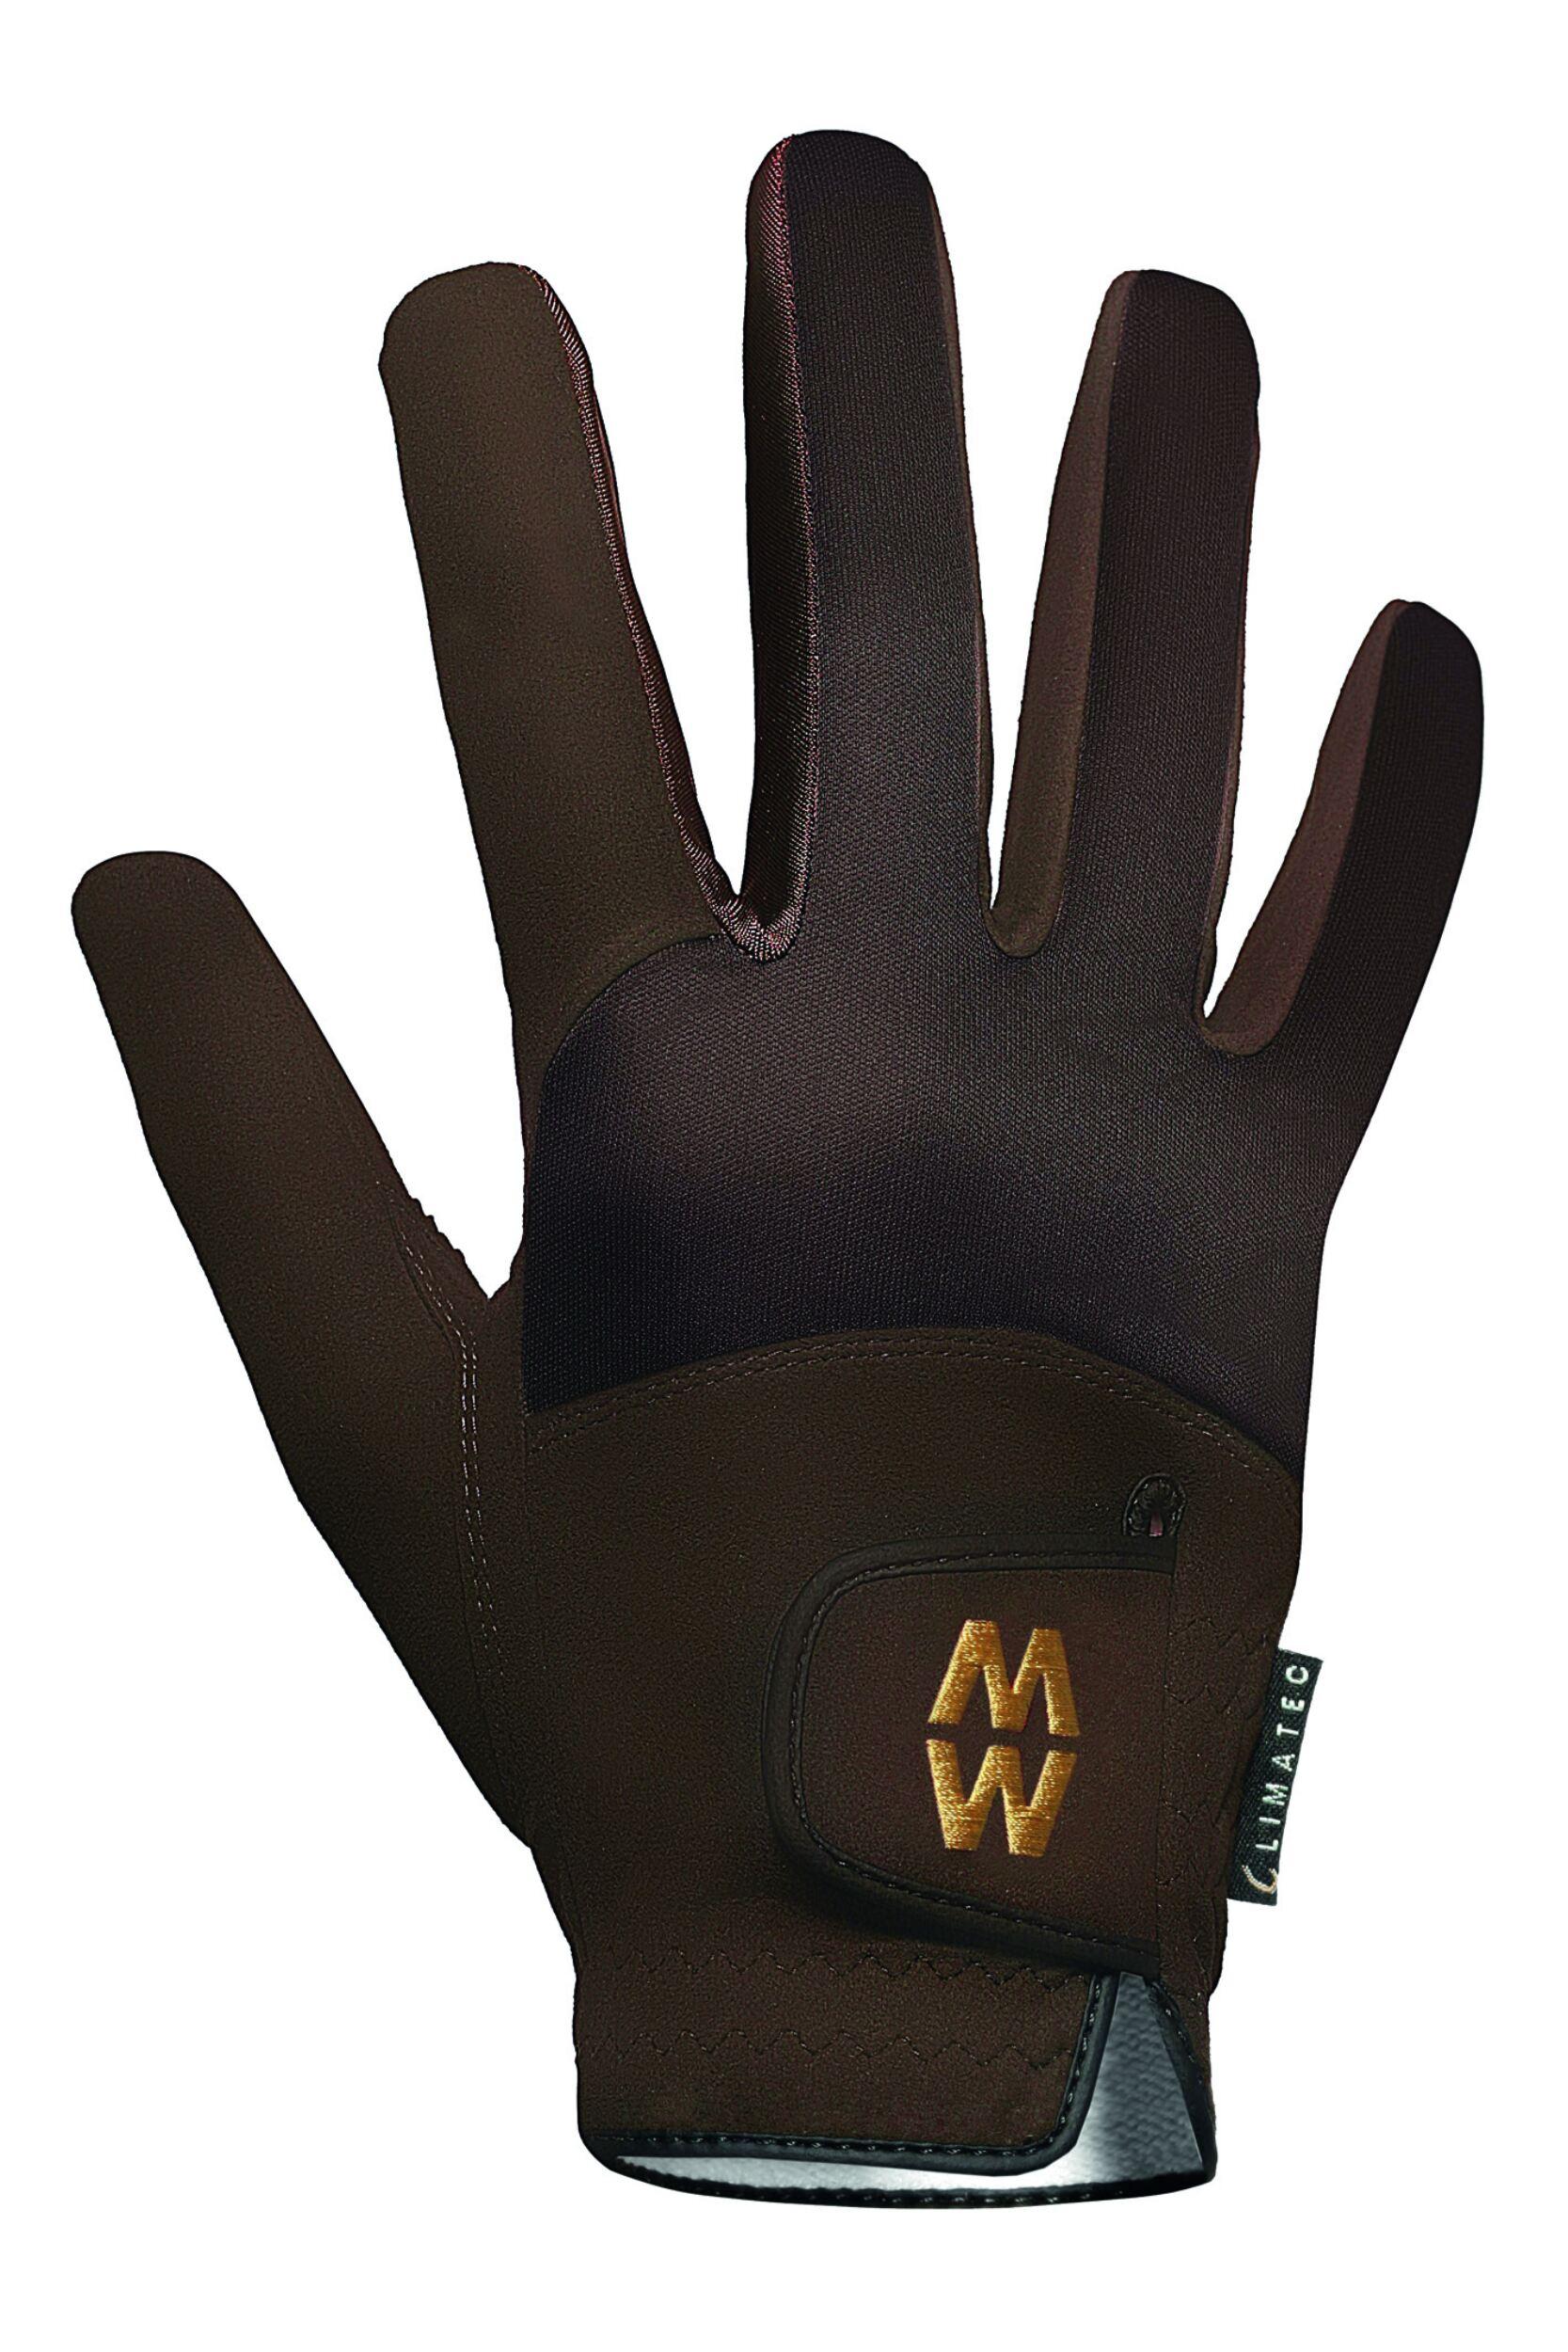 Mens /& Ladies 1 Pair MacWet Short Climatec Sports Gloves